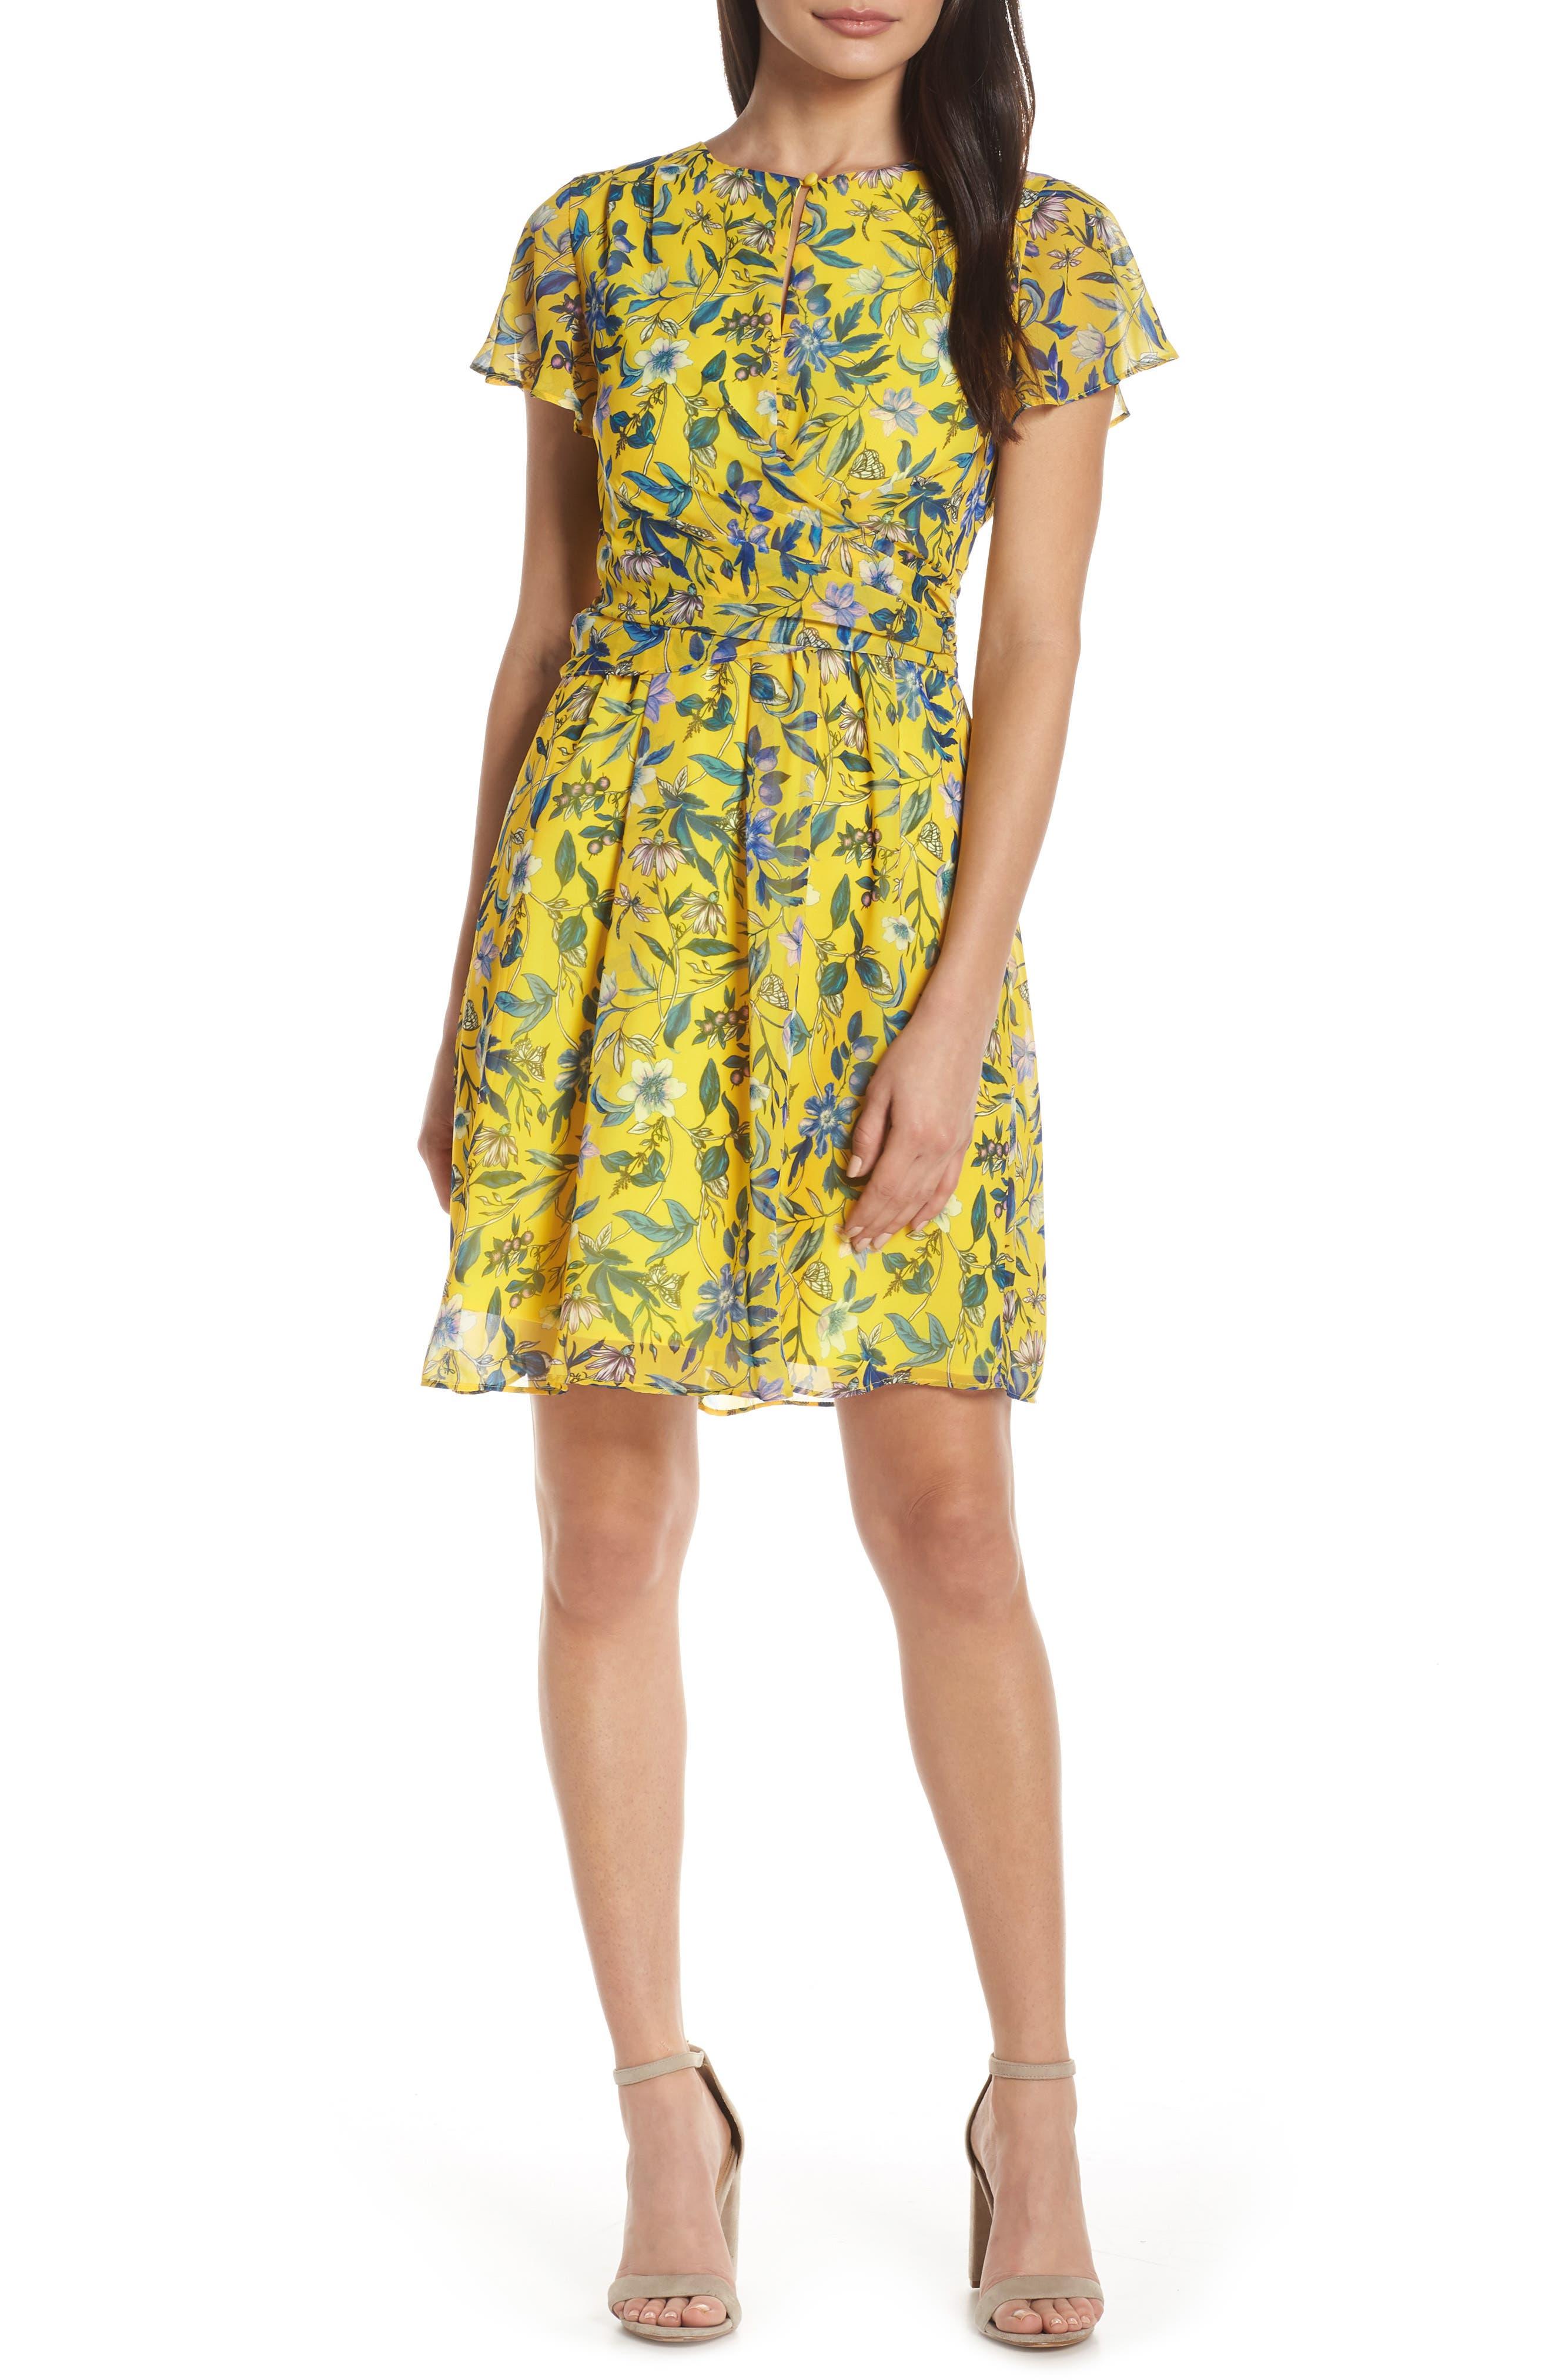 Sam Edelman Floral Fit & Flare Dress, Yellow